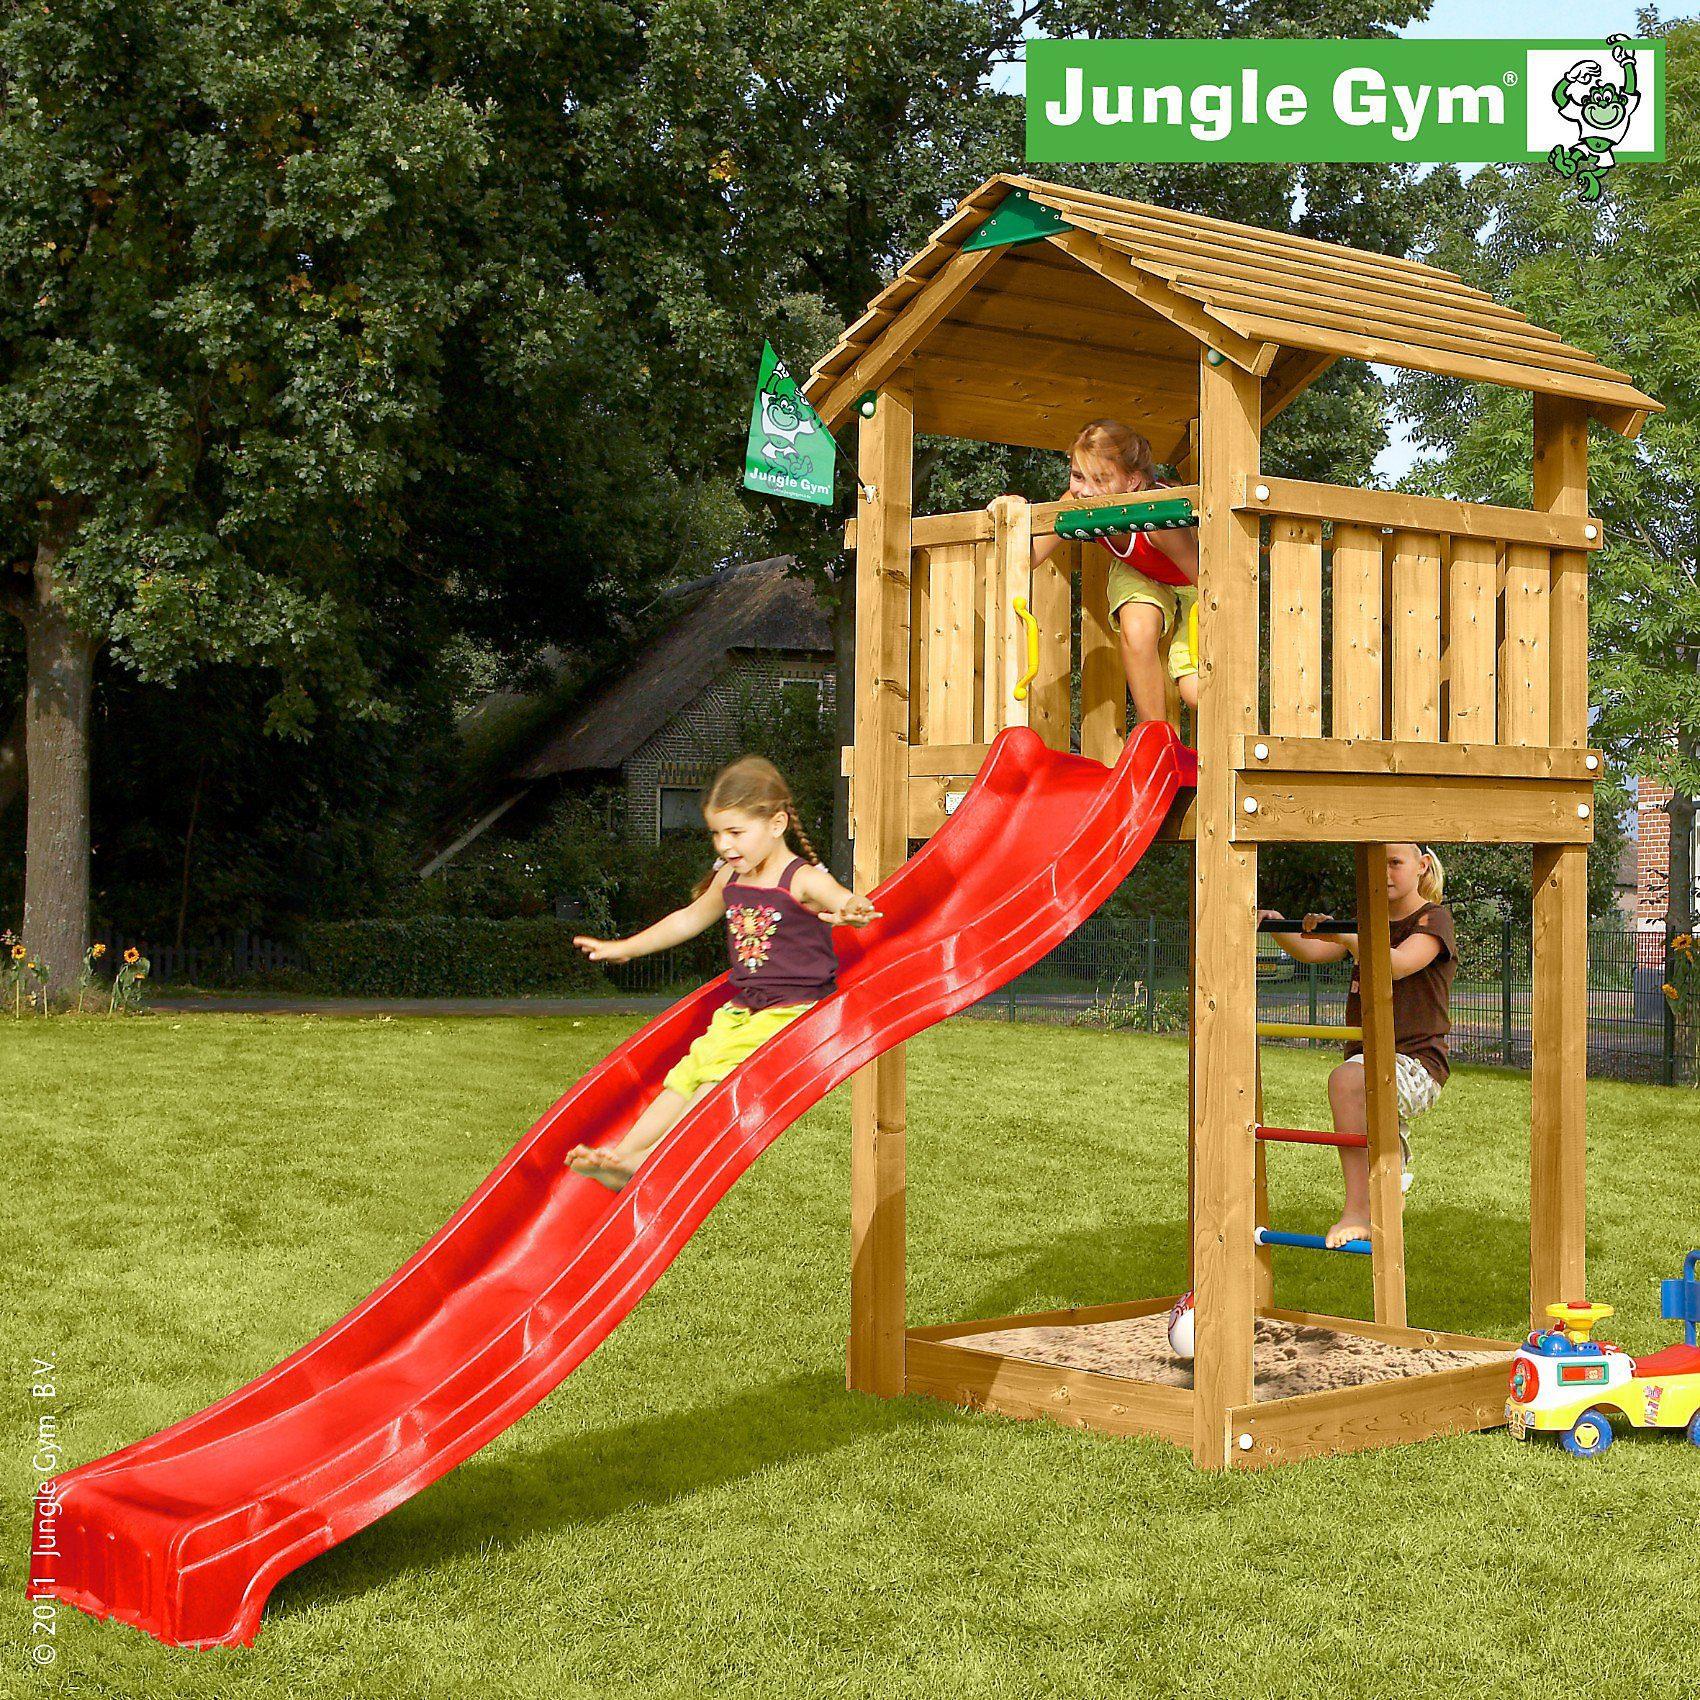 Spielturm Jungle Gym. spielturm jungle fort von jungle gym ...